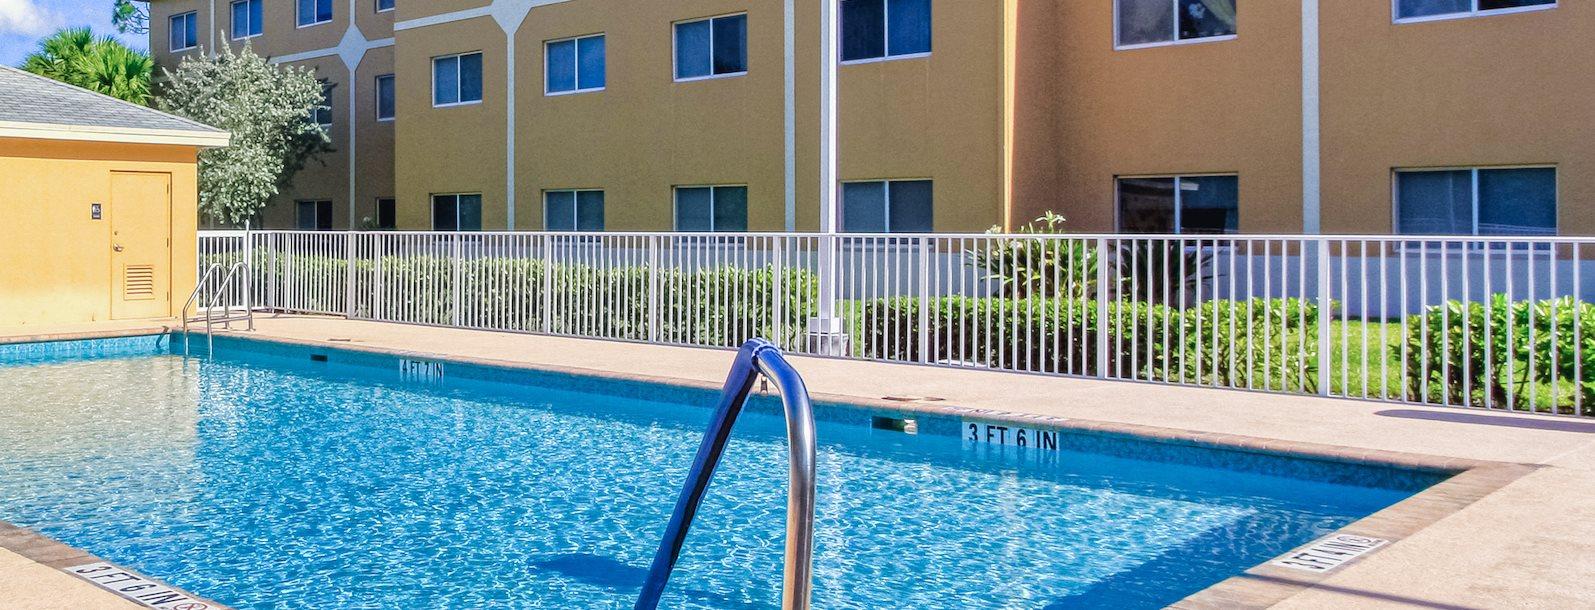 Sparkling pool at Villa Seton beside apartment buildings